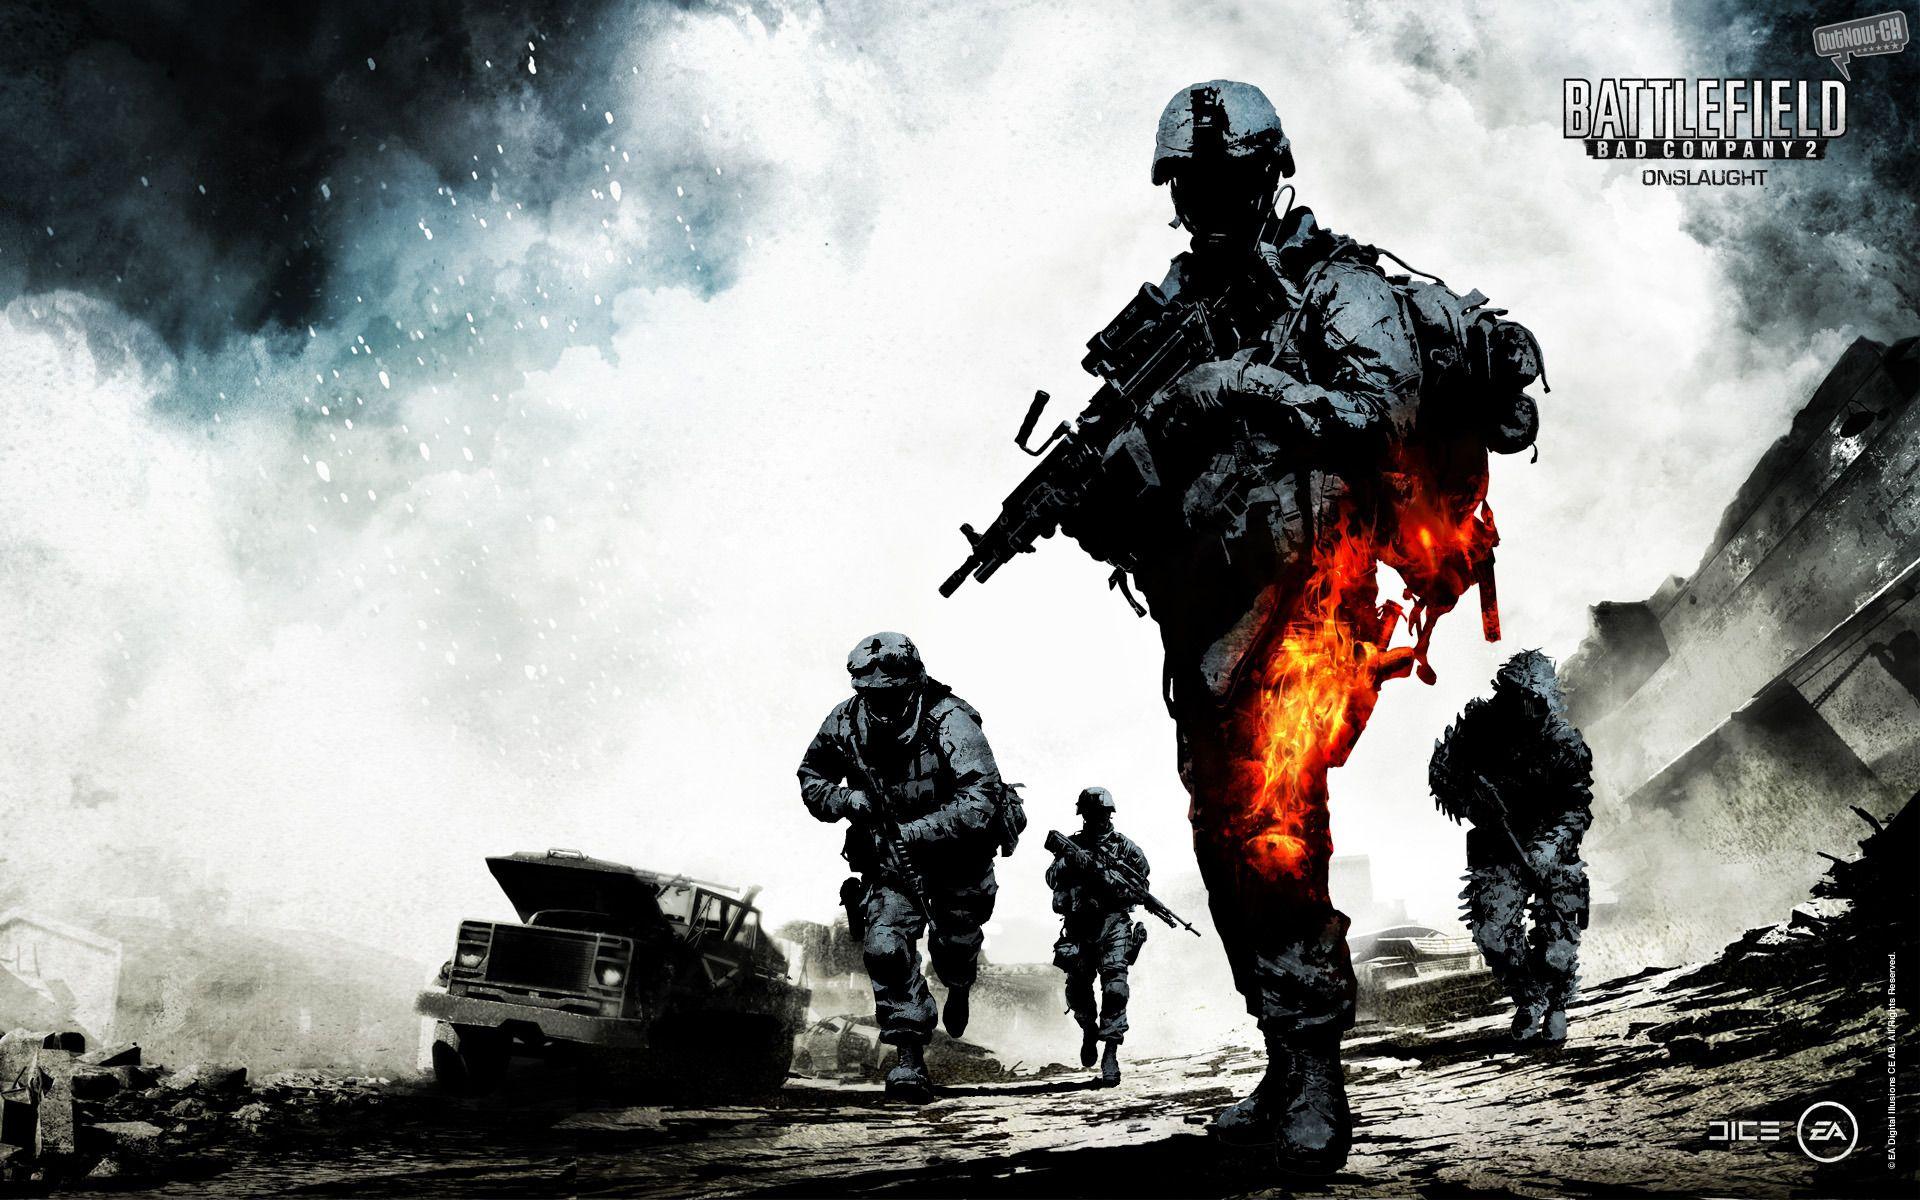 Battlefield 2 wallpapers full hd wallpaper search gameshd vio battlefield 2 wallpapers full hd wallpaper search gameshd voltagebd Image collections